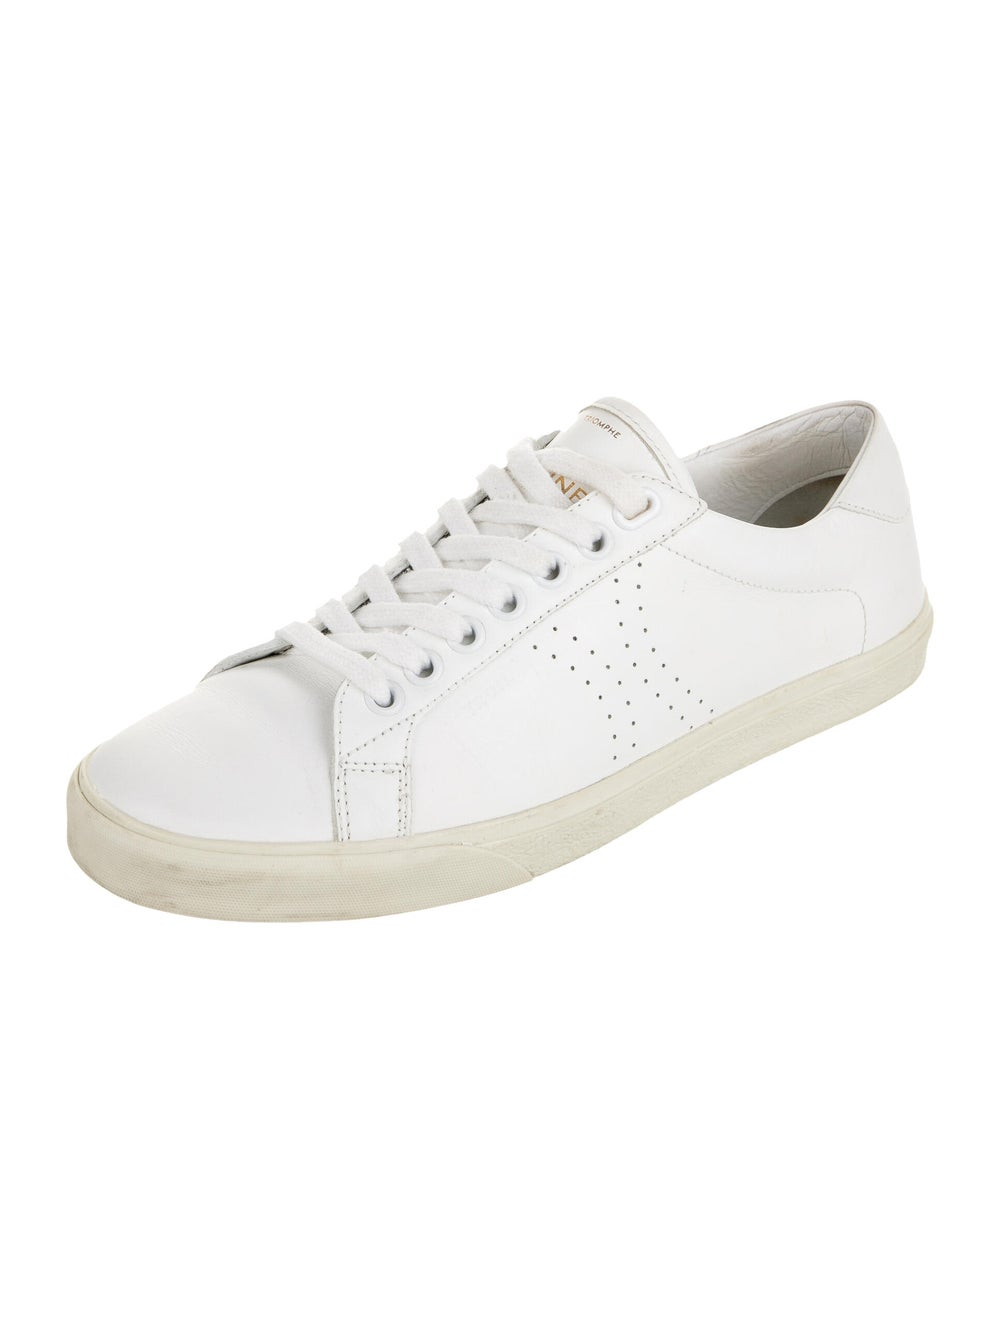 Celine Triomphe Sneakers White - image 2